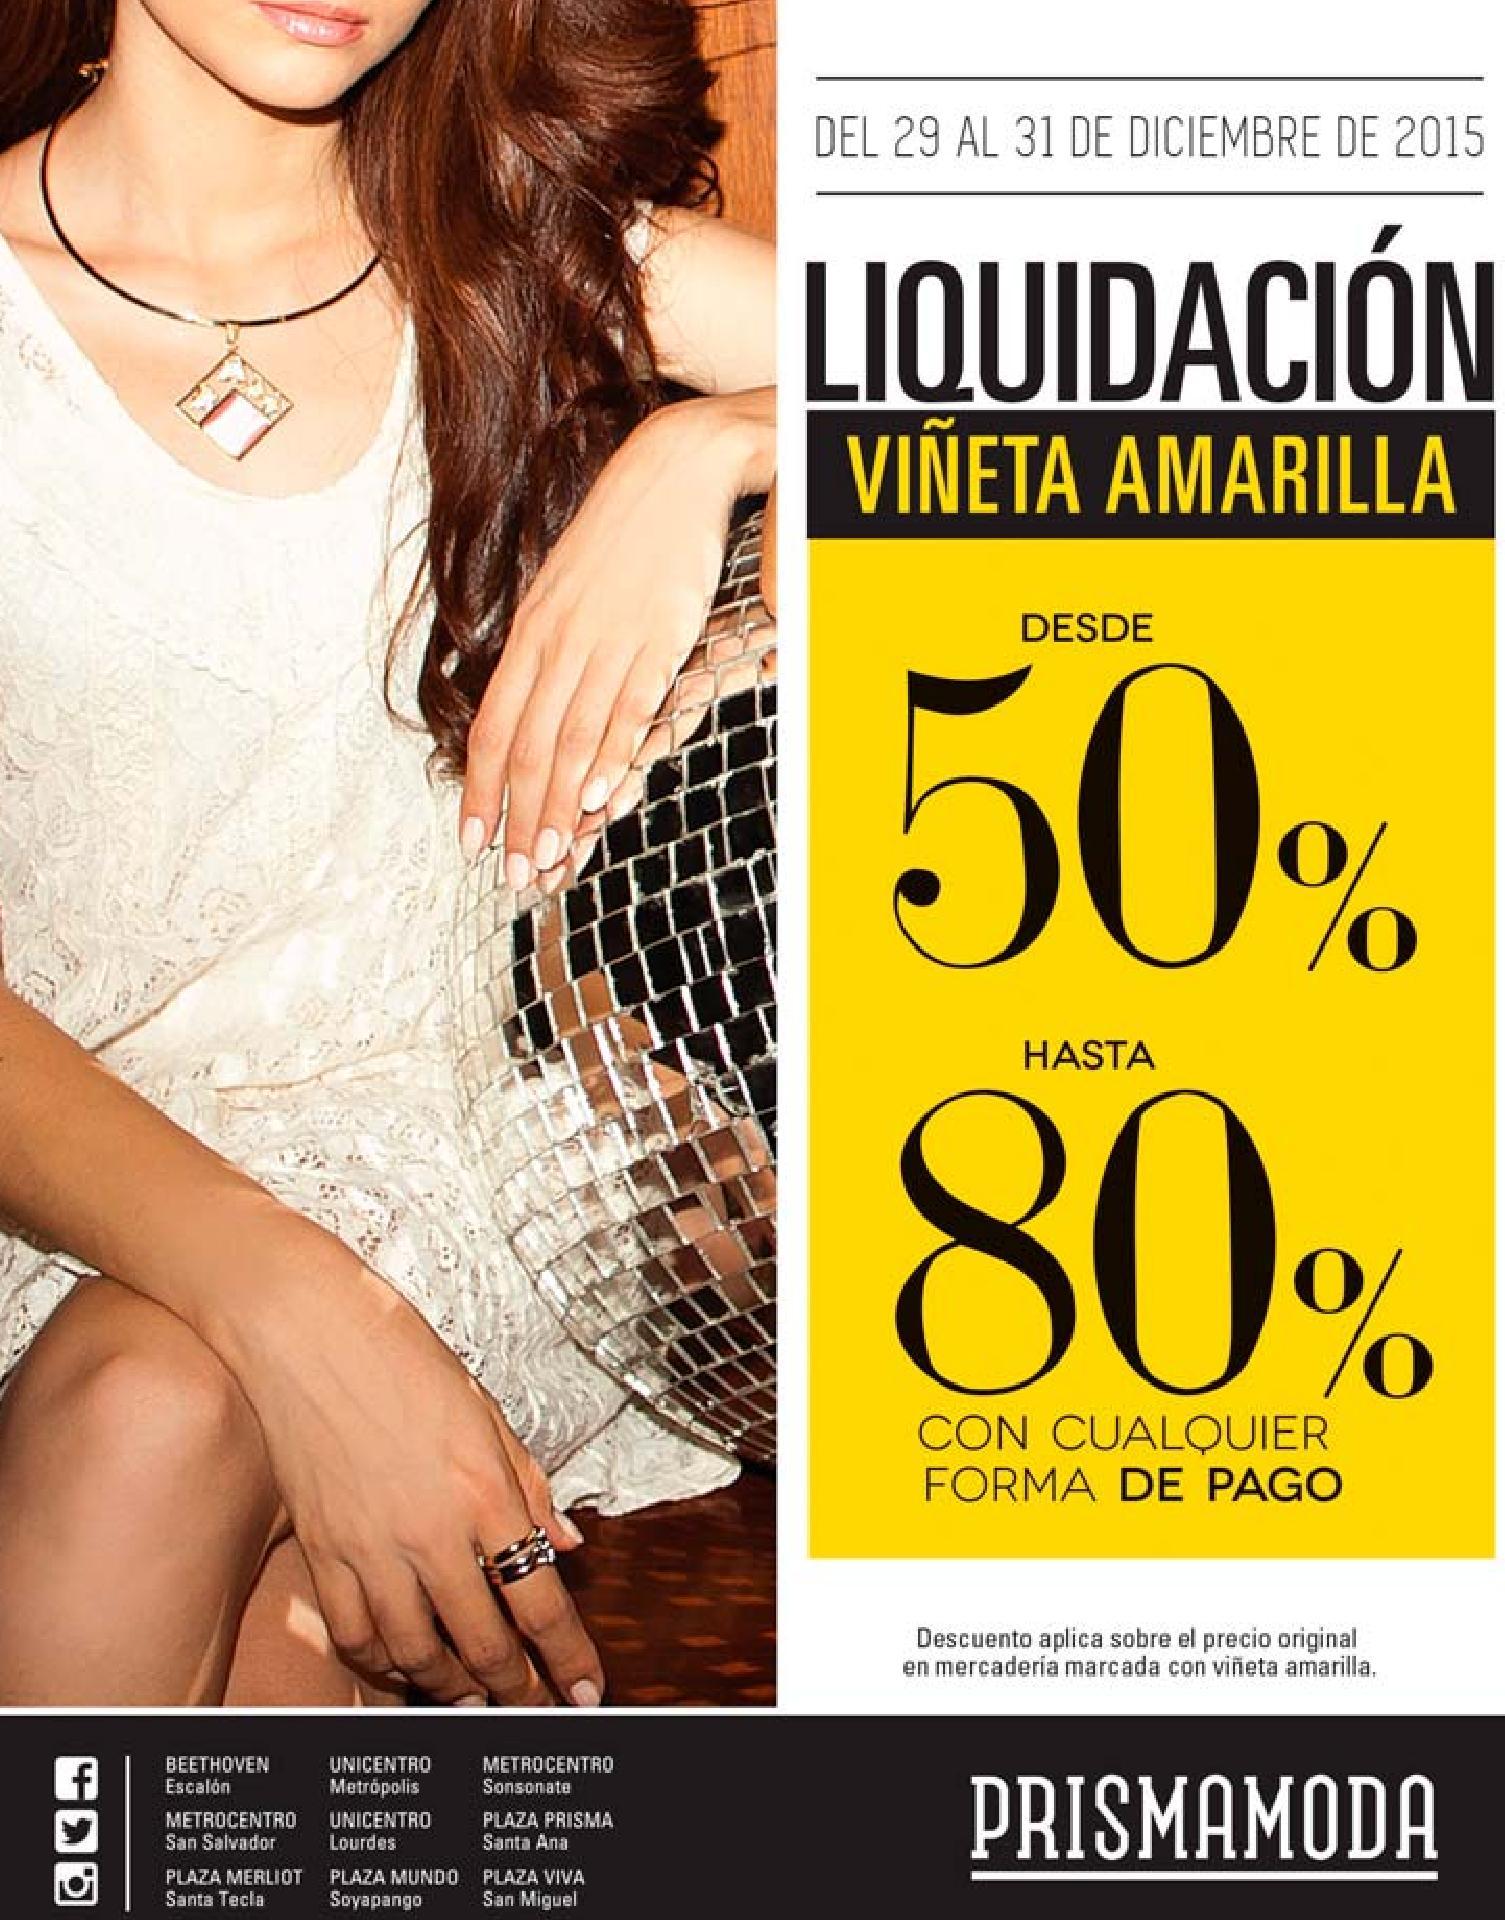 Prisma moda LIQuidaCION con viñeta amarilla - 29dic15